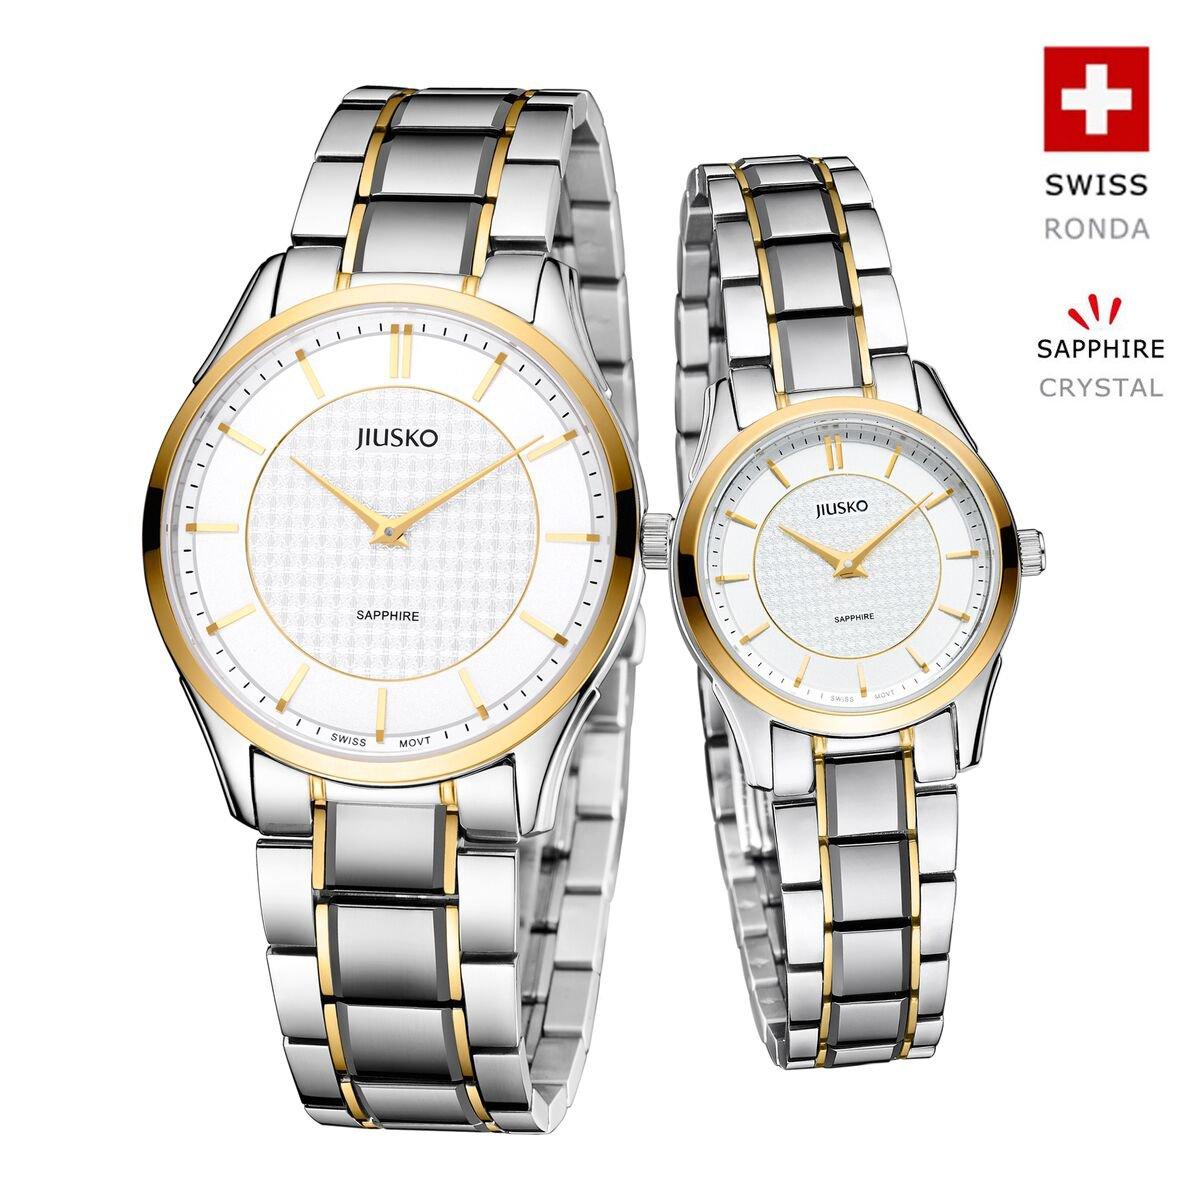 Jiusko Swiss - His Hers Couples Quartz Dress Wrist Watches - Two Tone - Sapphire - Tungsten - 325